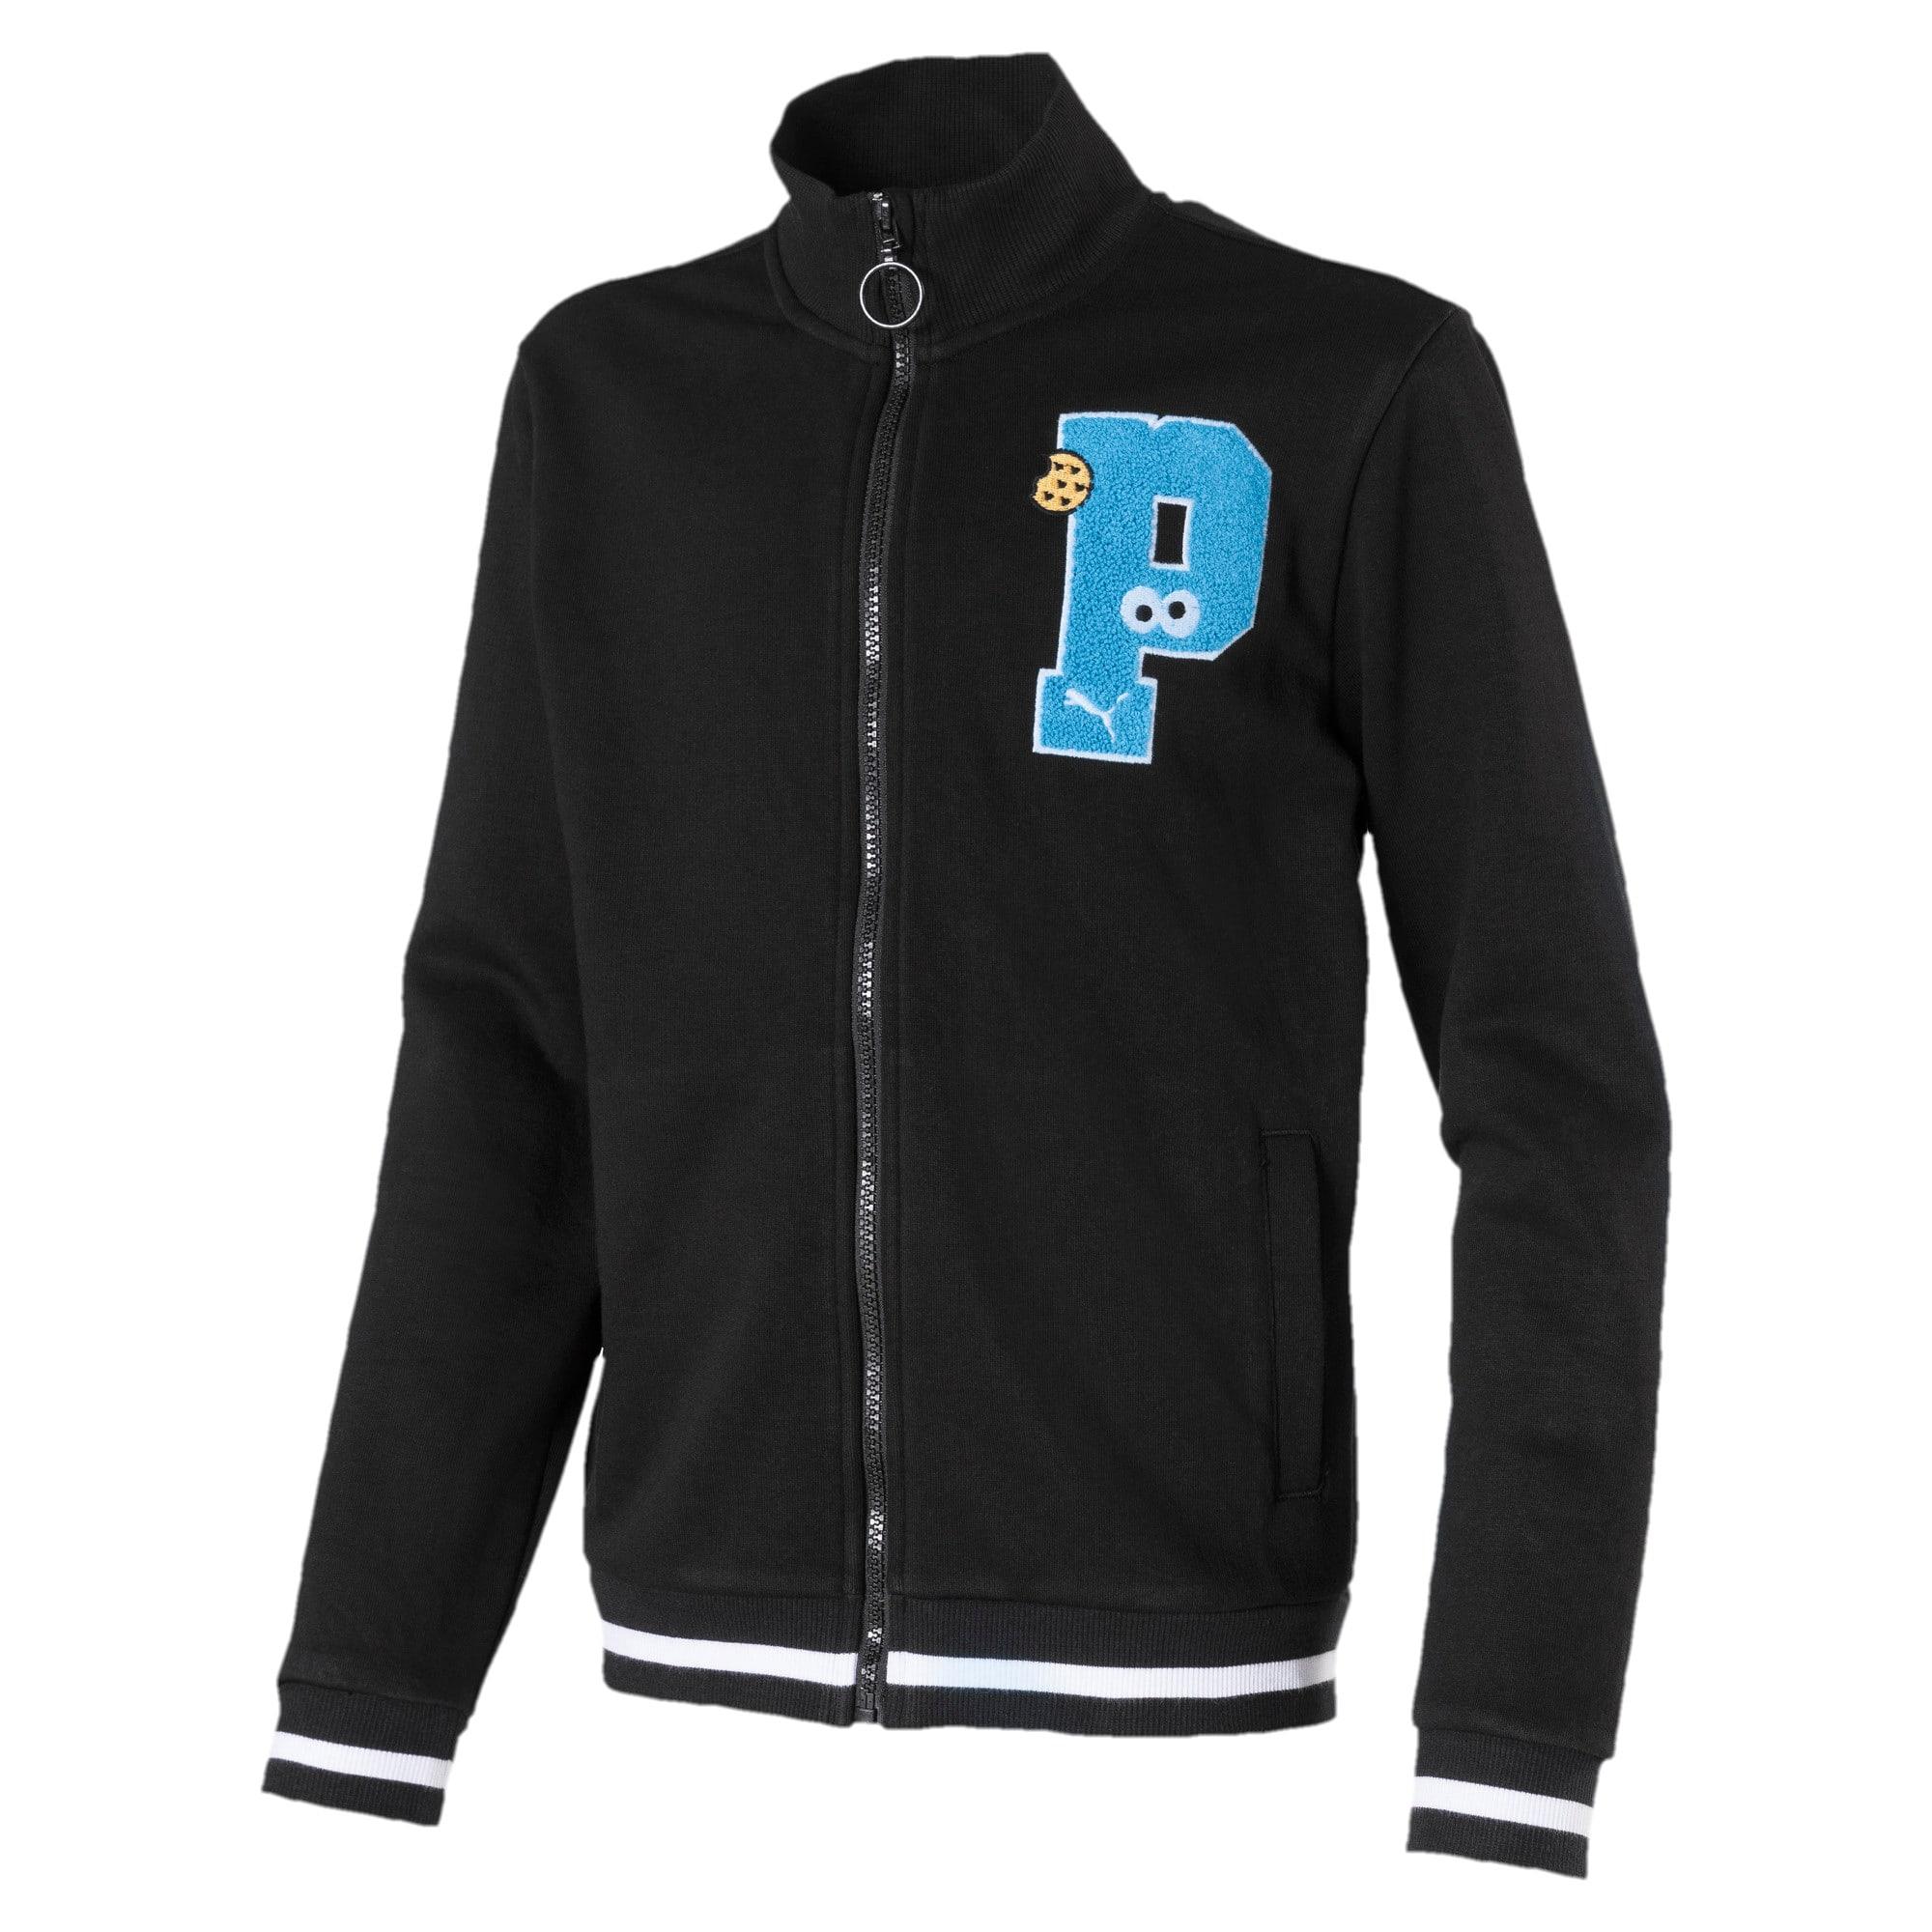 Sesame Street Boys' Sweat Jacket, Zwart, Maat 152   PUMA